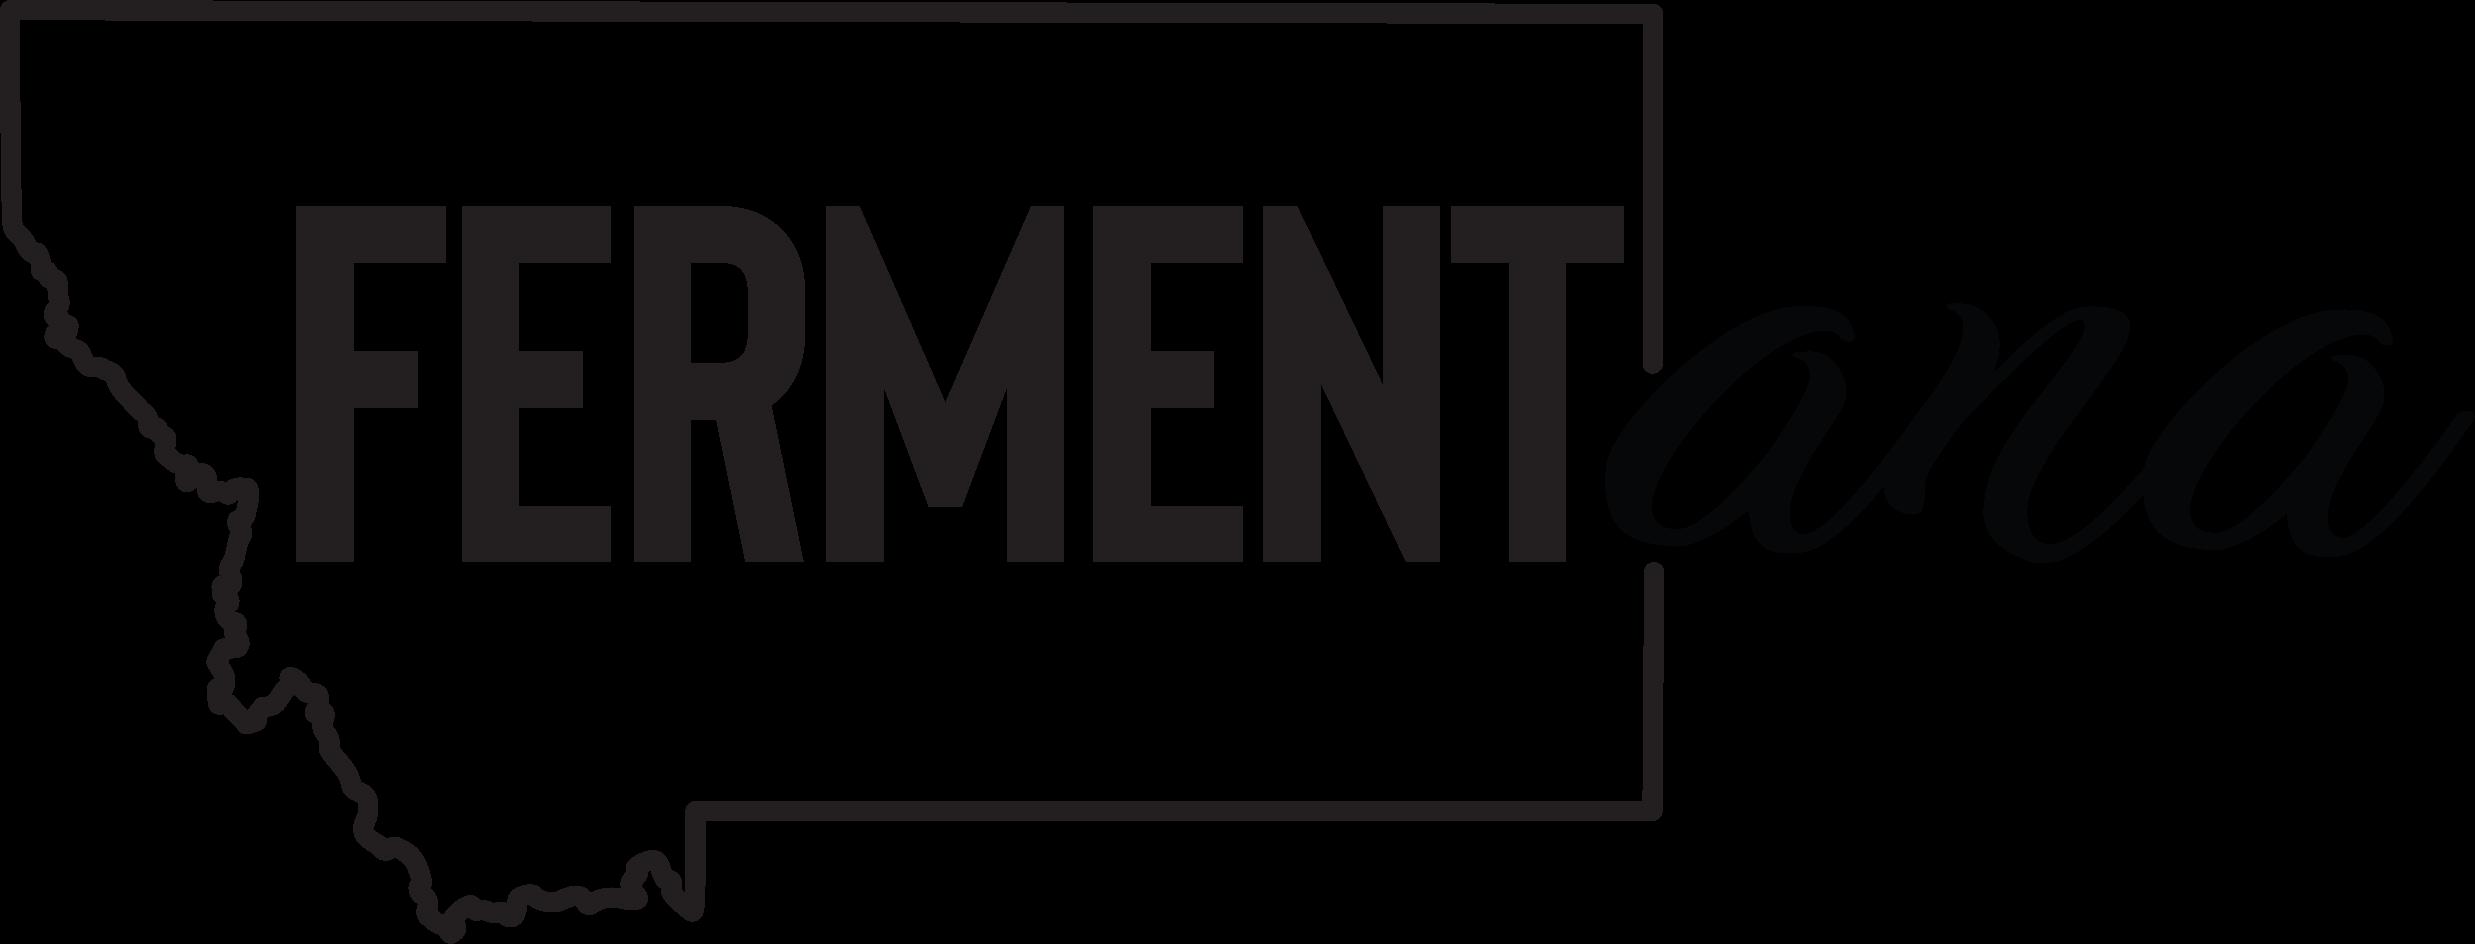 Fermentana 2018-01.png